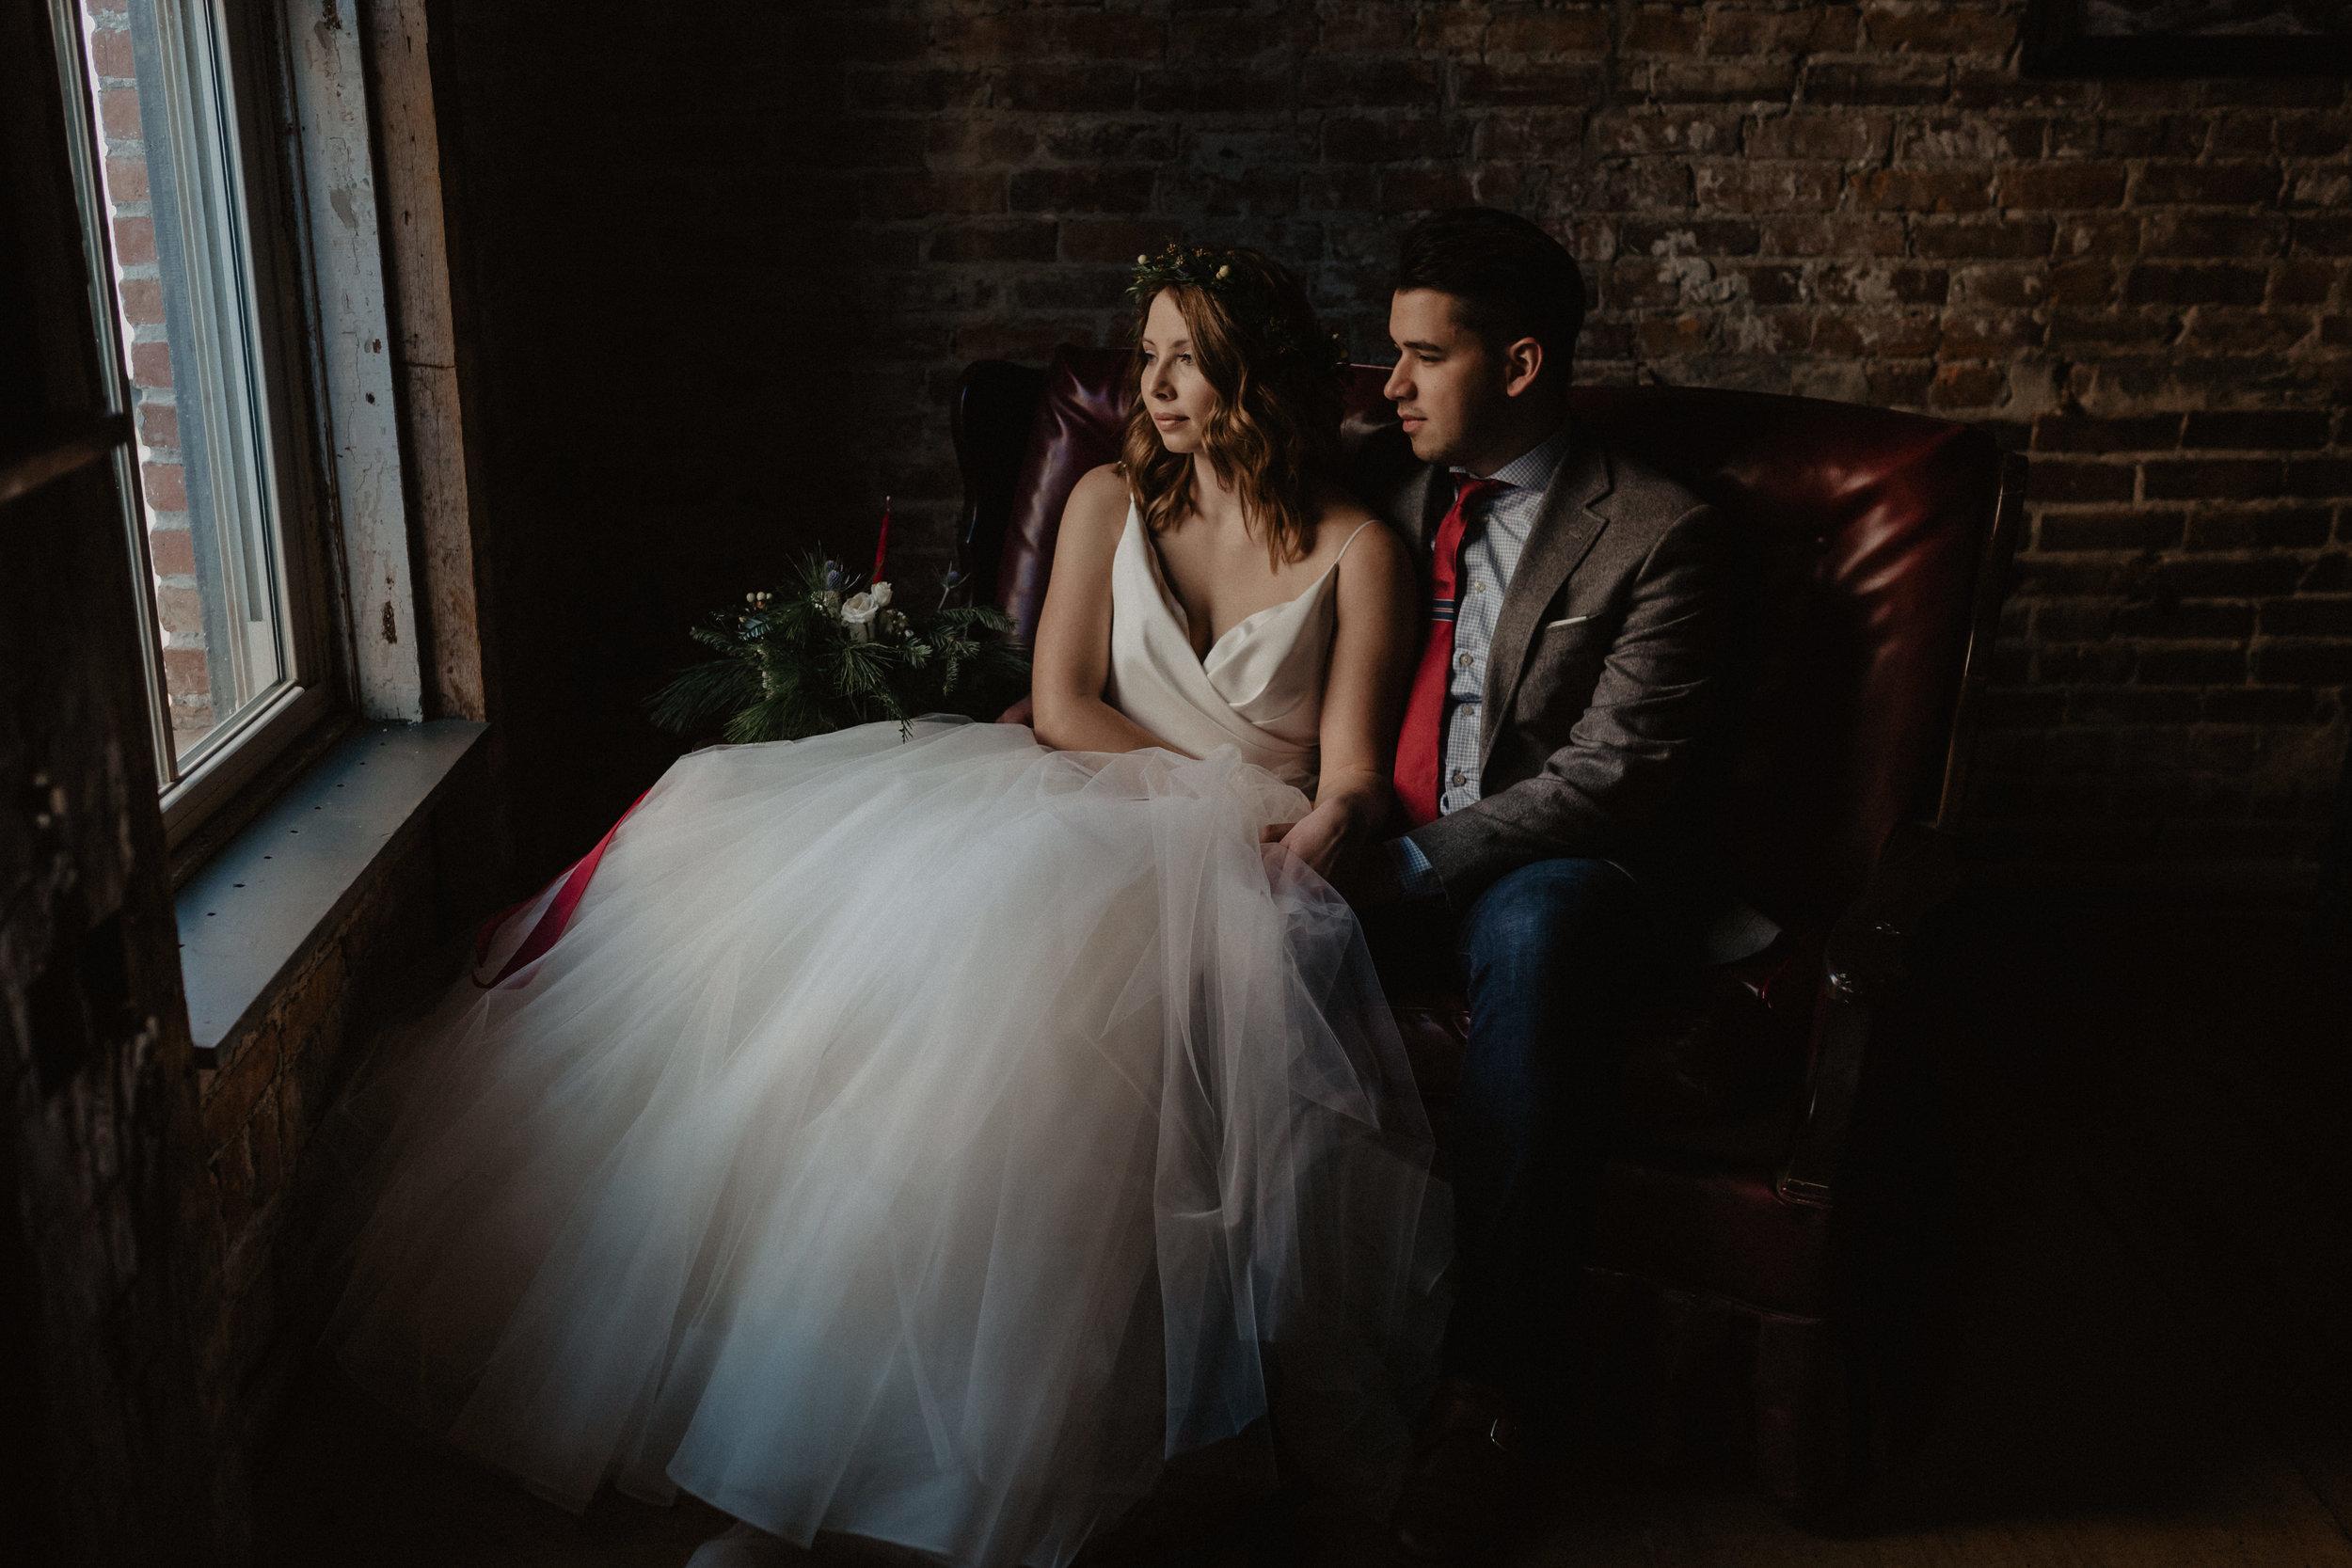 lucas_confectionery_wedding-28.jpg